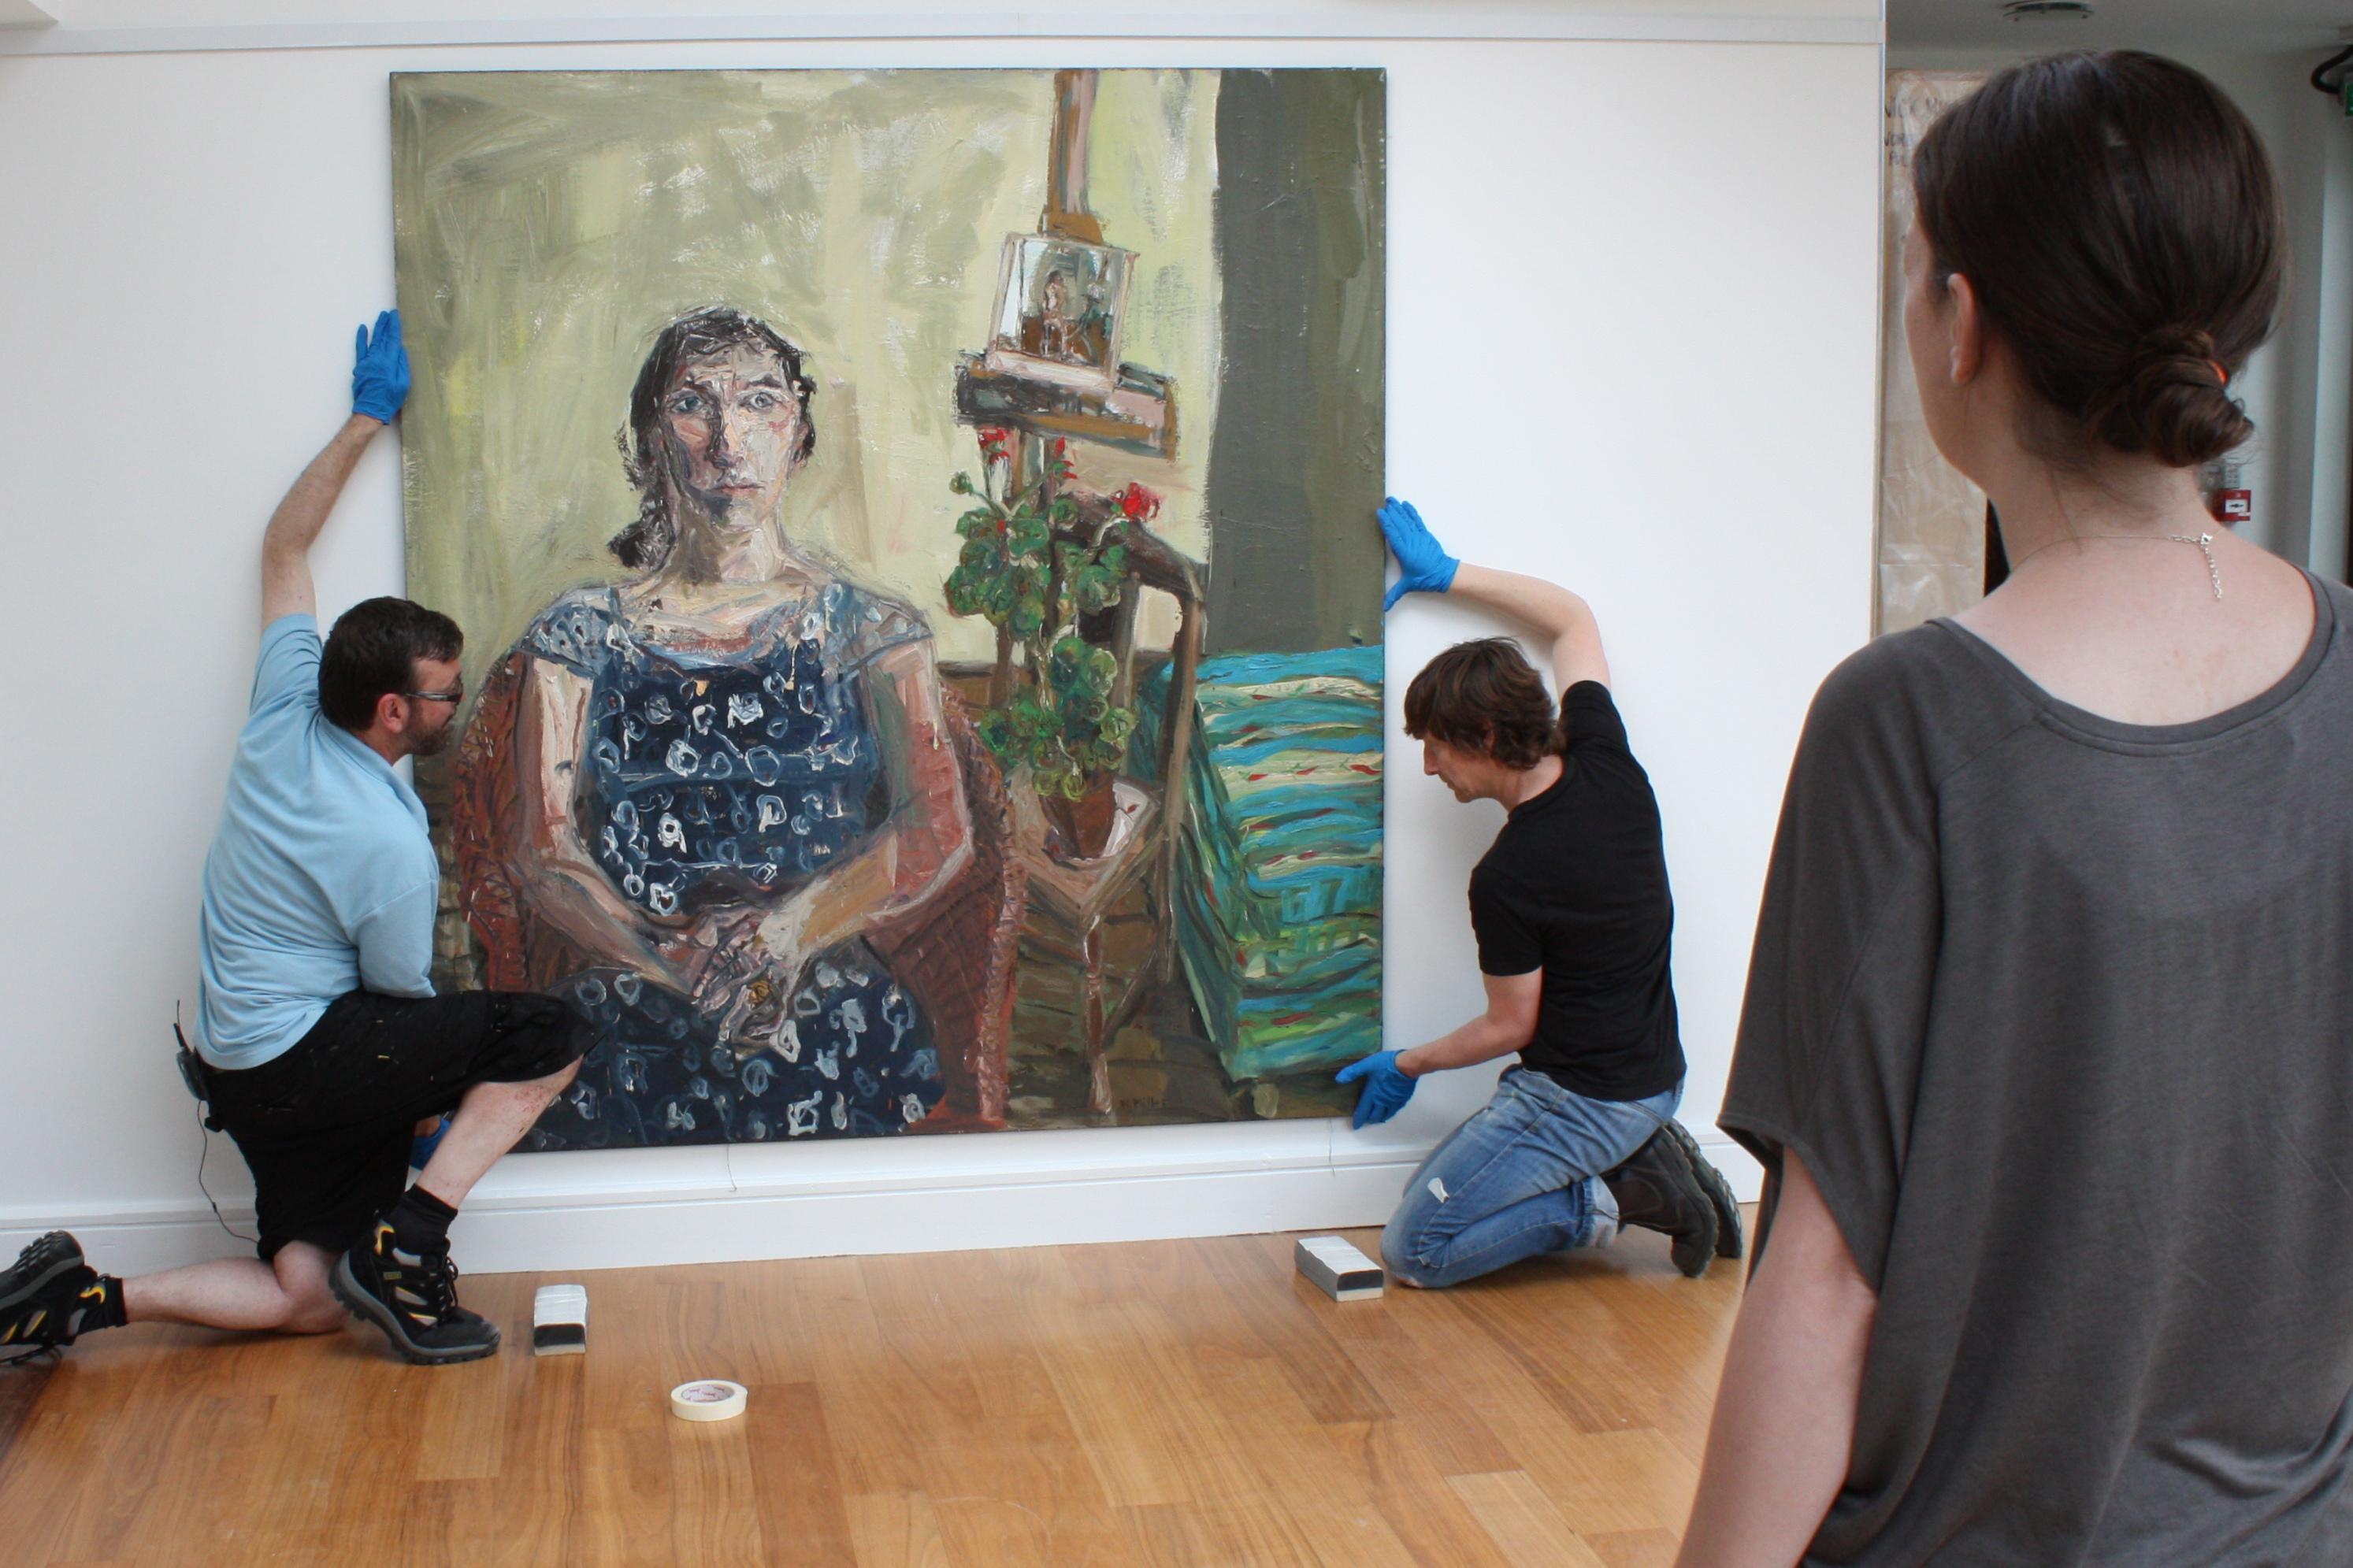 Installing Noreen 1, Nick Miller Arthouse 2014 Image Lisa Fingleton